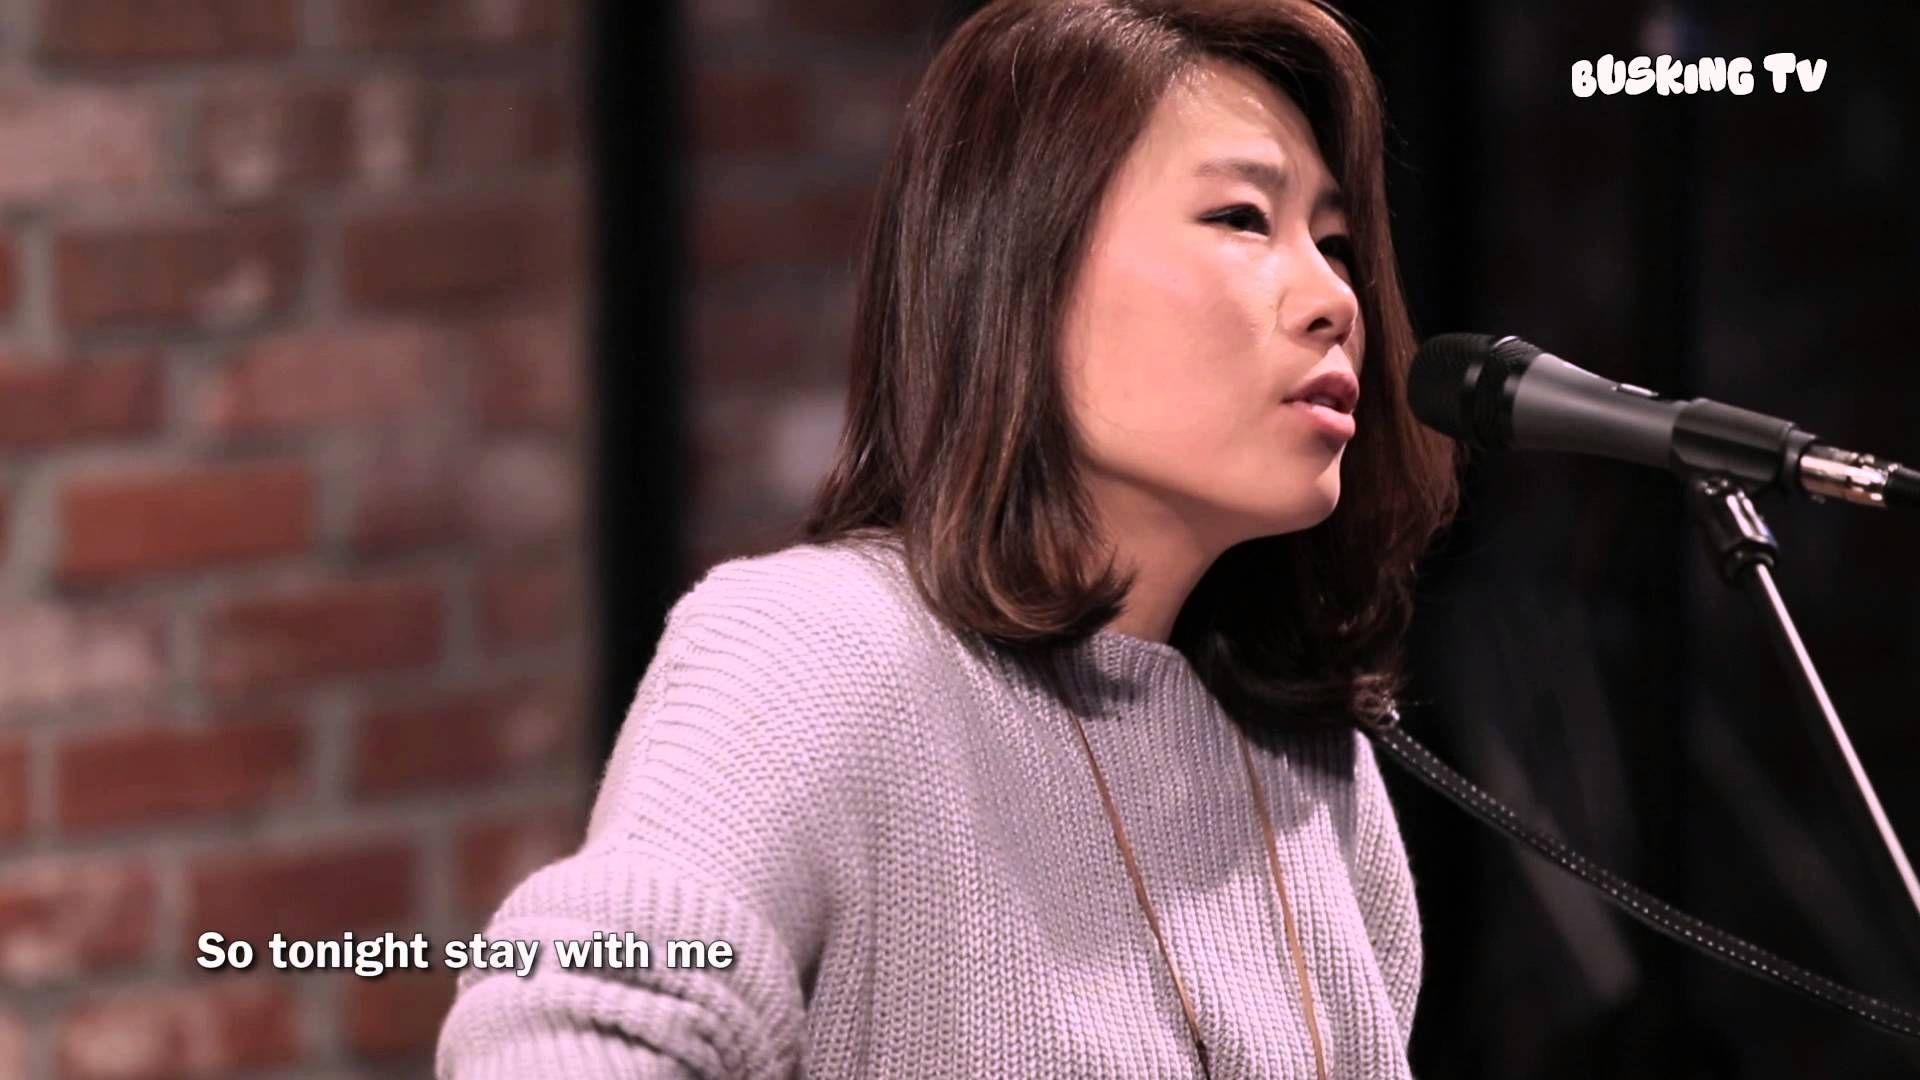 Busking TV You won't let me (Rachael Yamagata) - Cover by Doyeon Kim